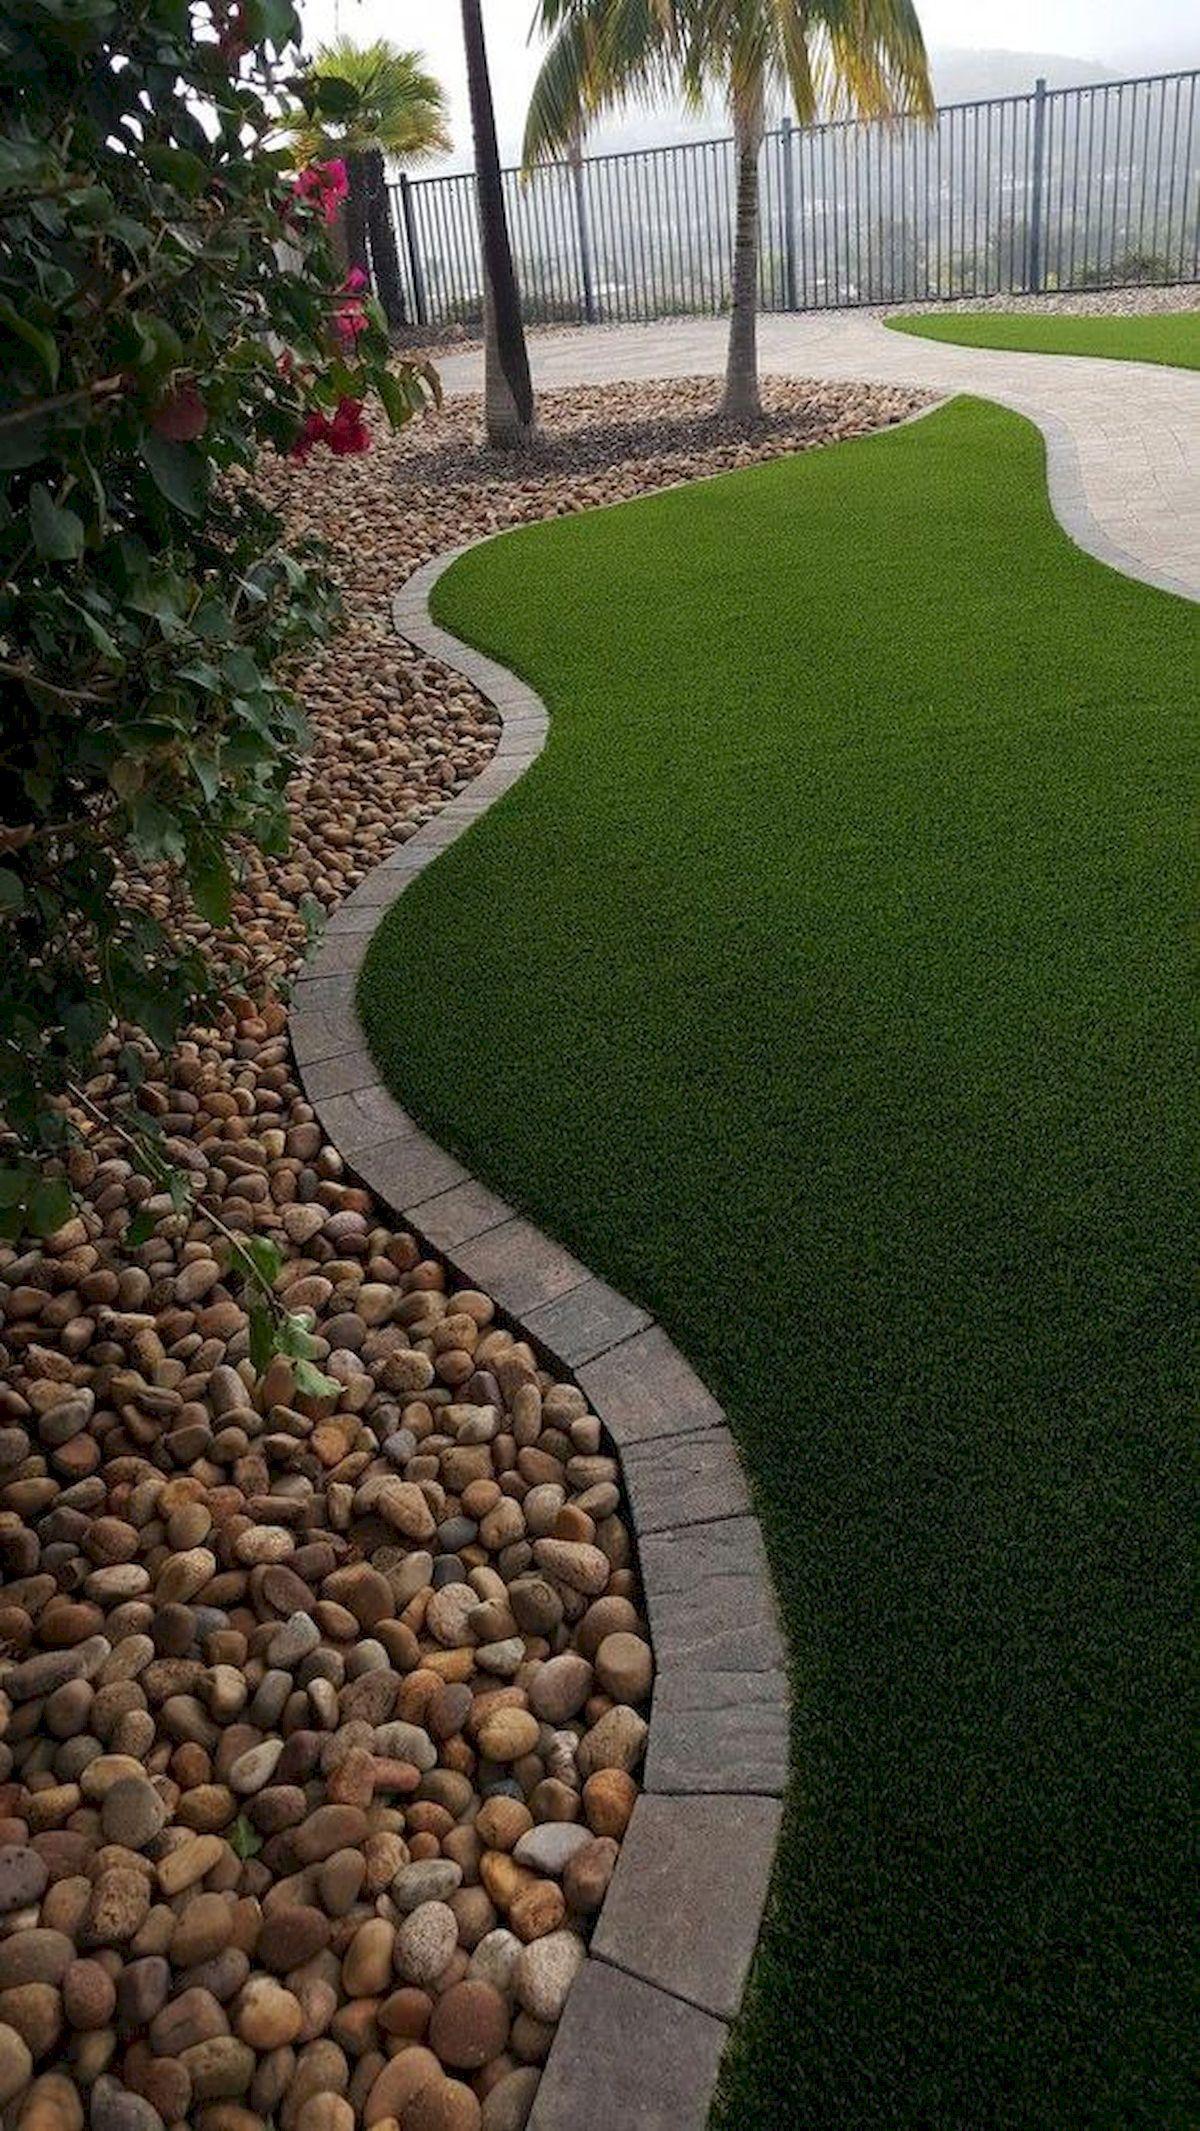 Genius Low Maintenance Rock Garden Design Ideas For Frontyard And Backyard 1 Side Yard Lan B In 2020 Rock Garden Design Side Yard Landscaping Landscaping With Rocks